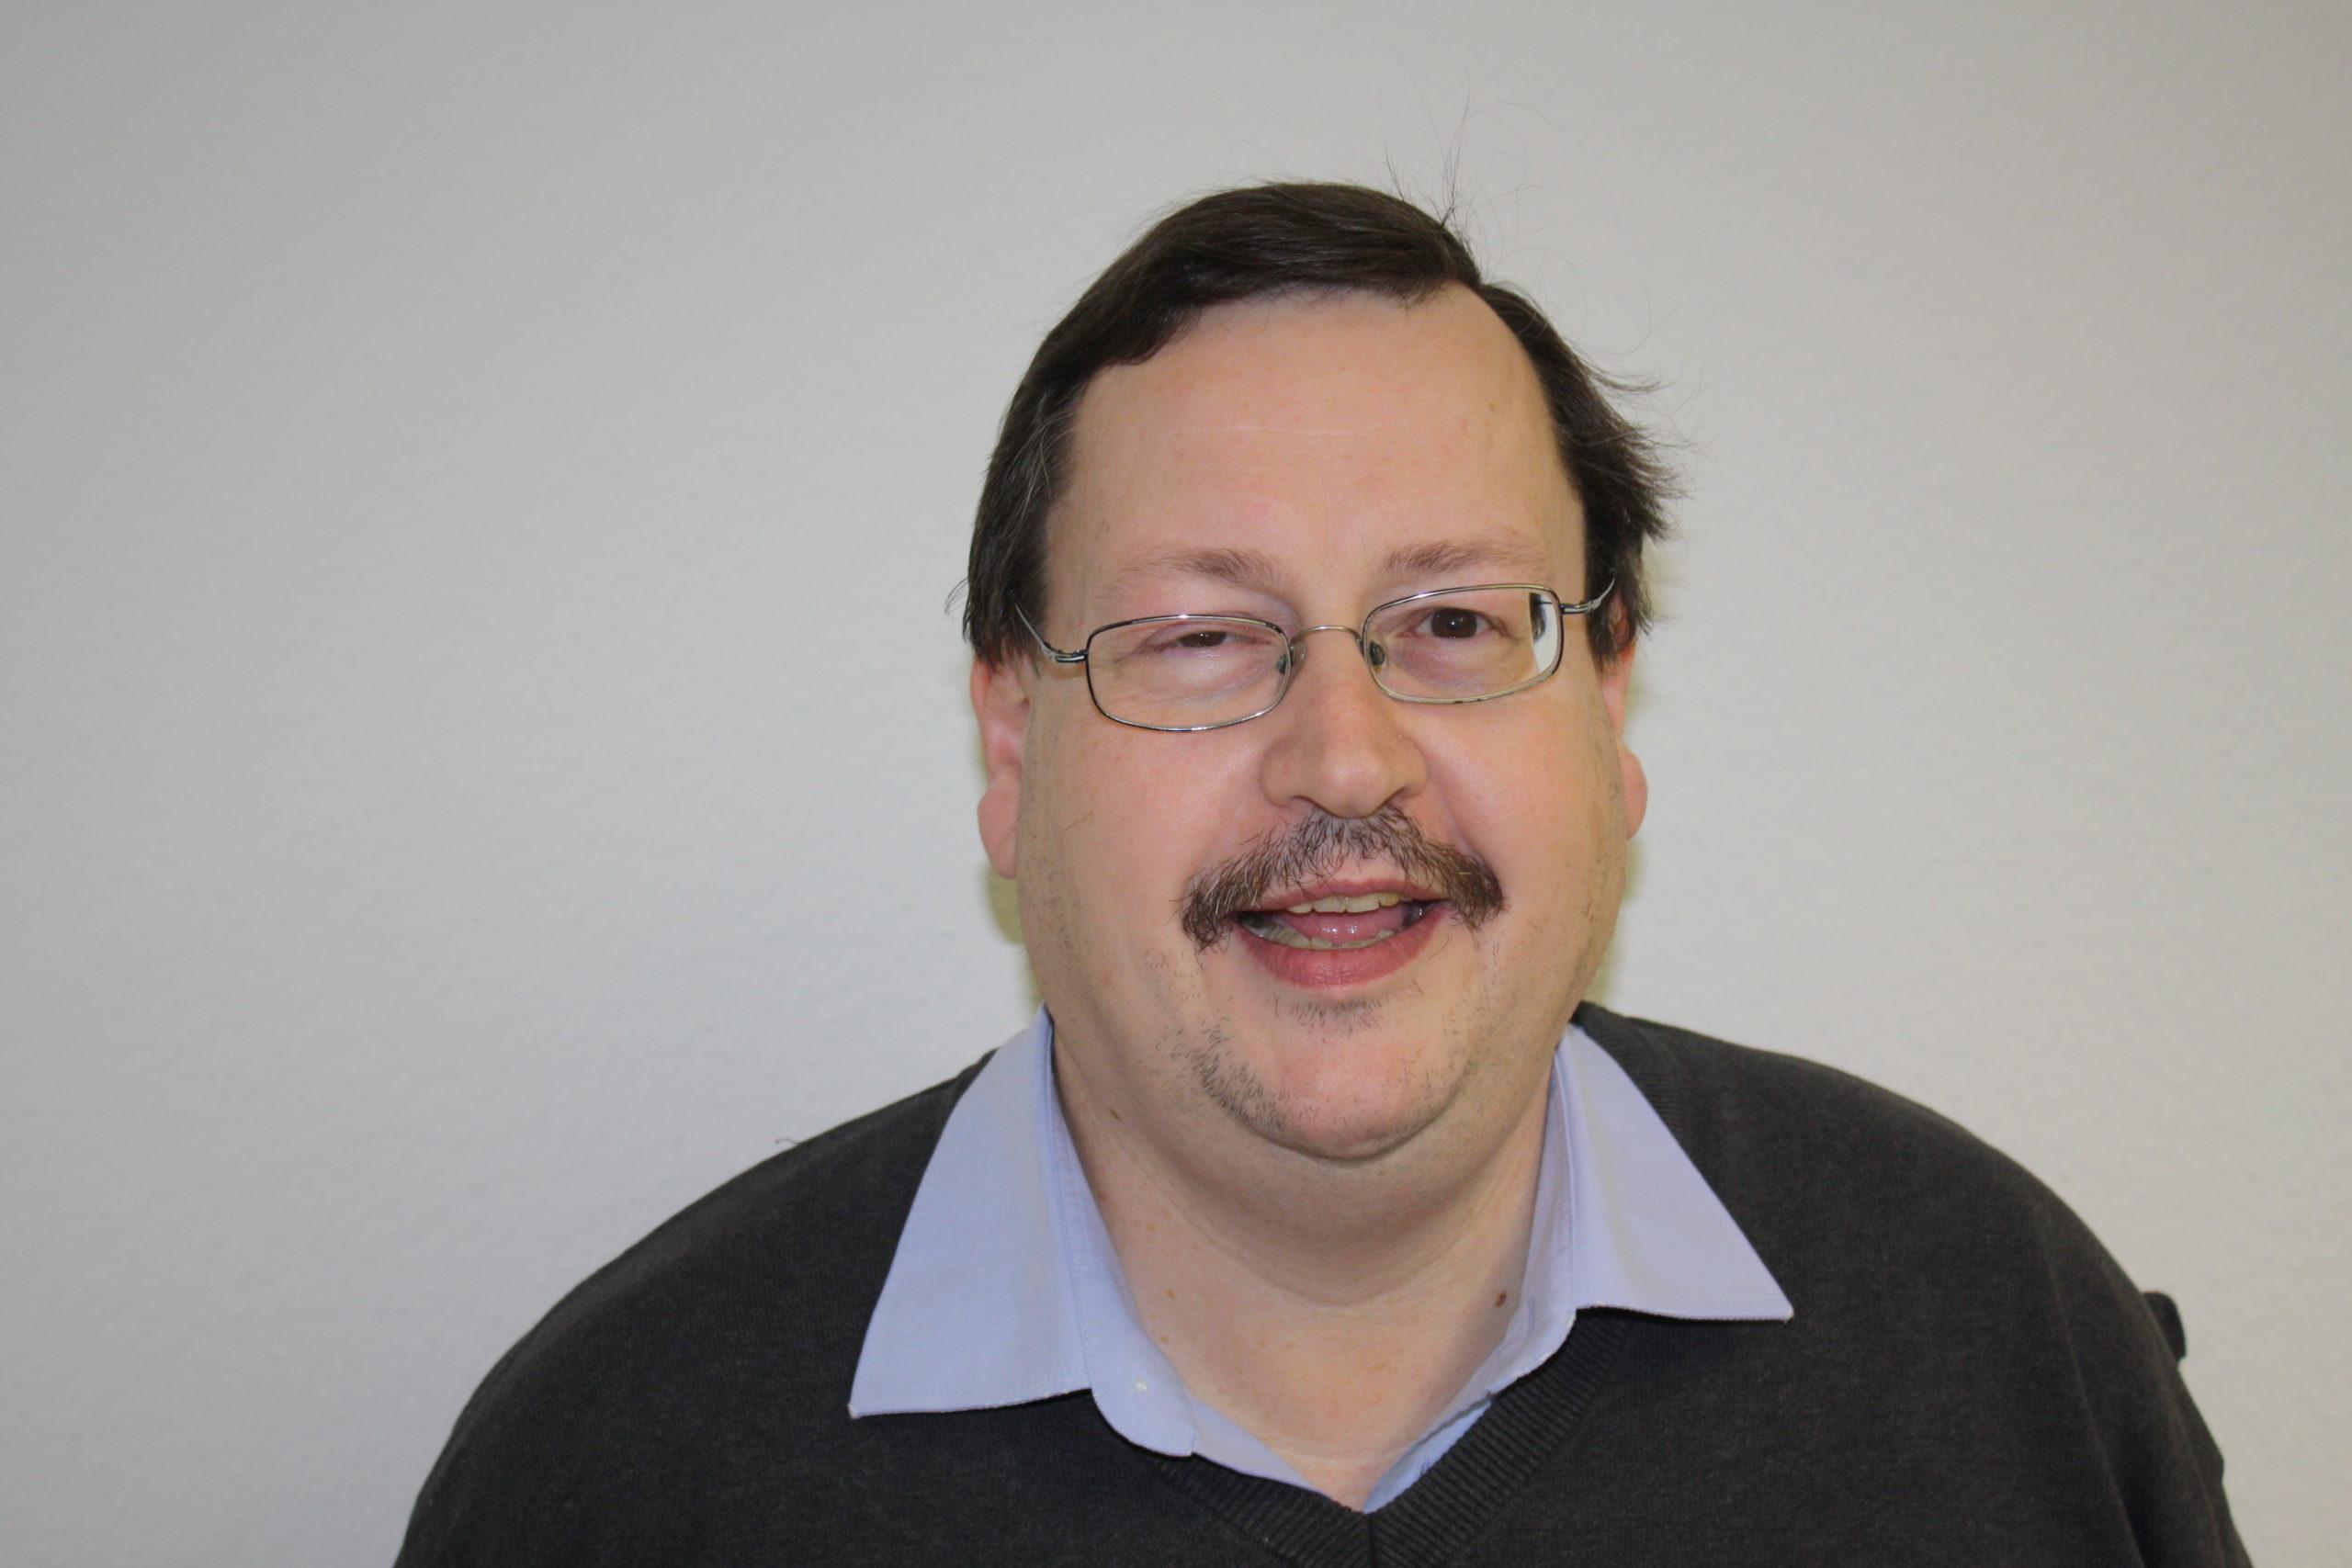 Dr. Albert Engel